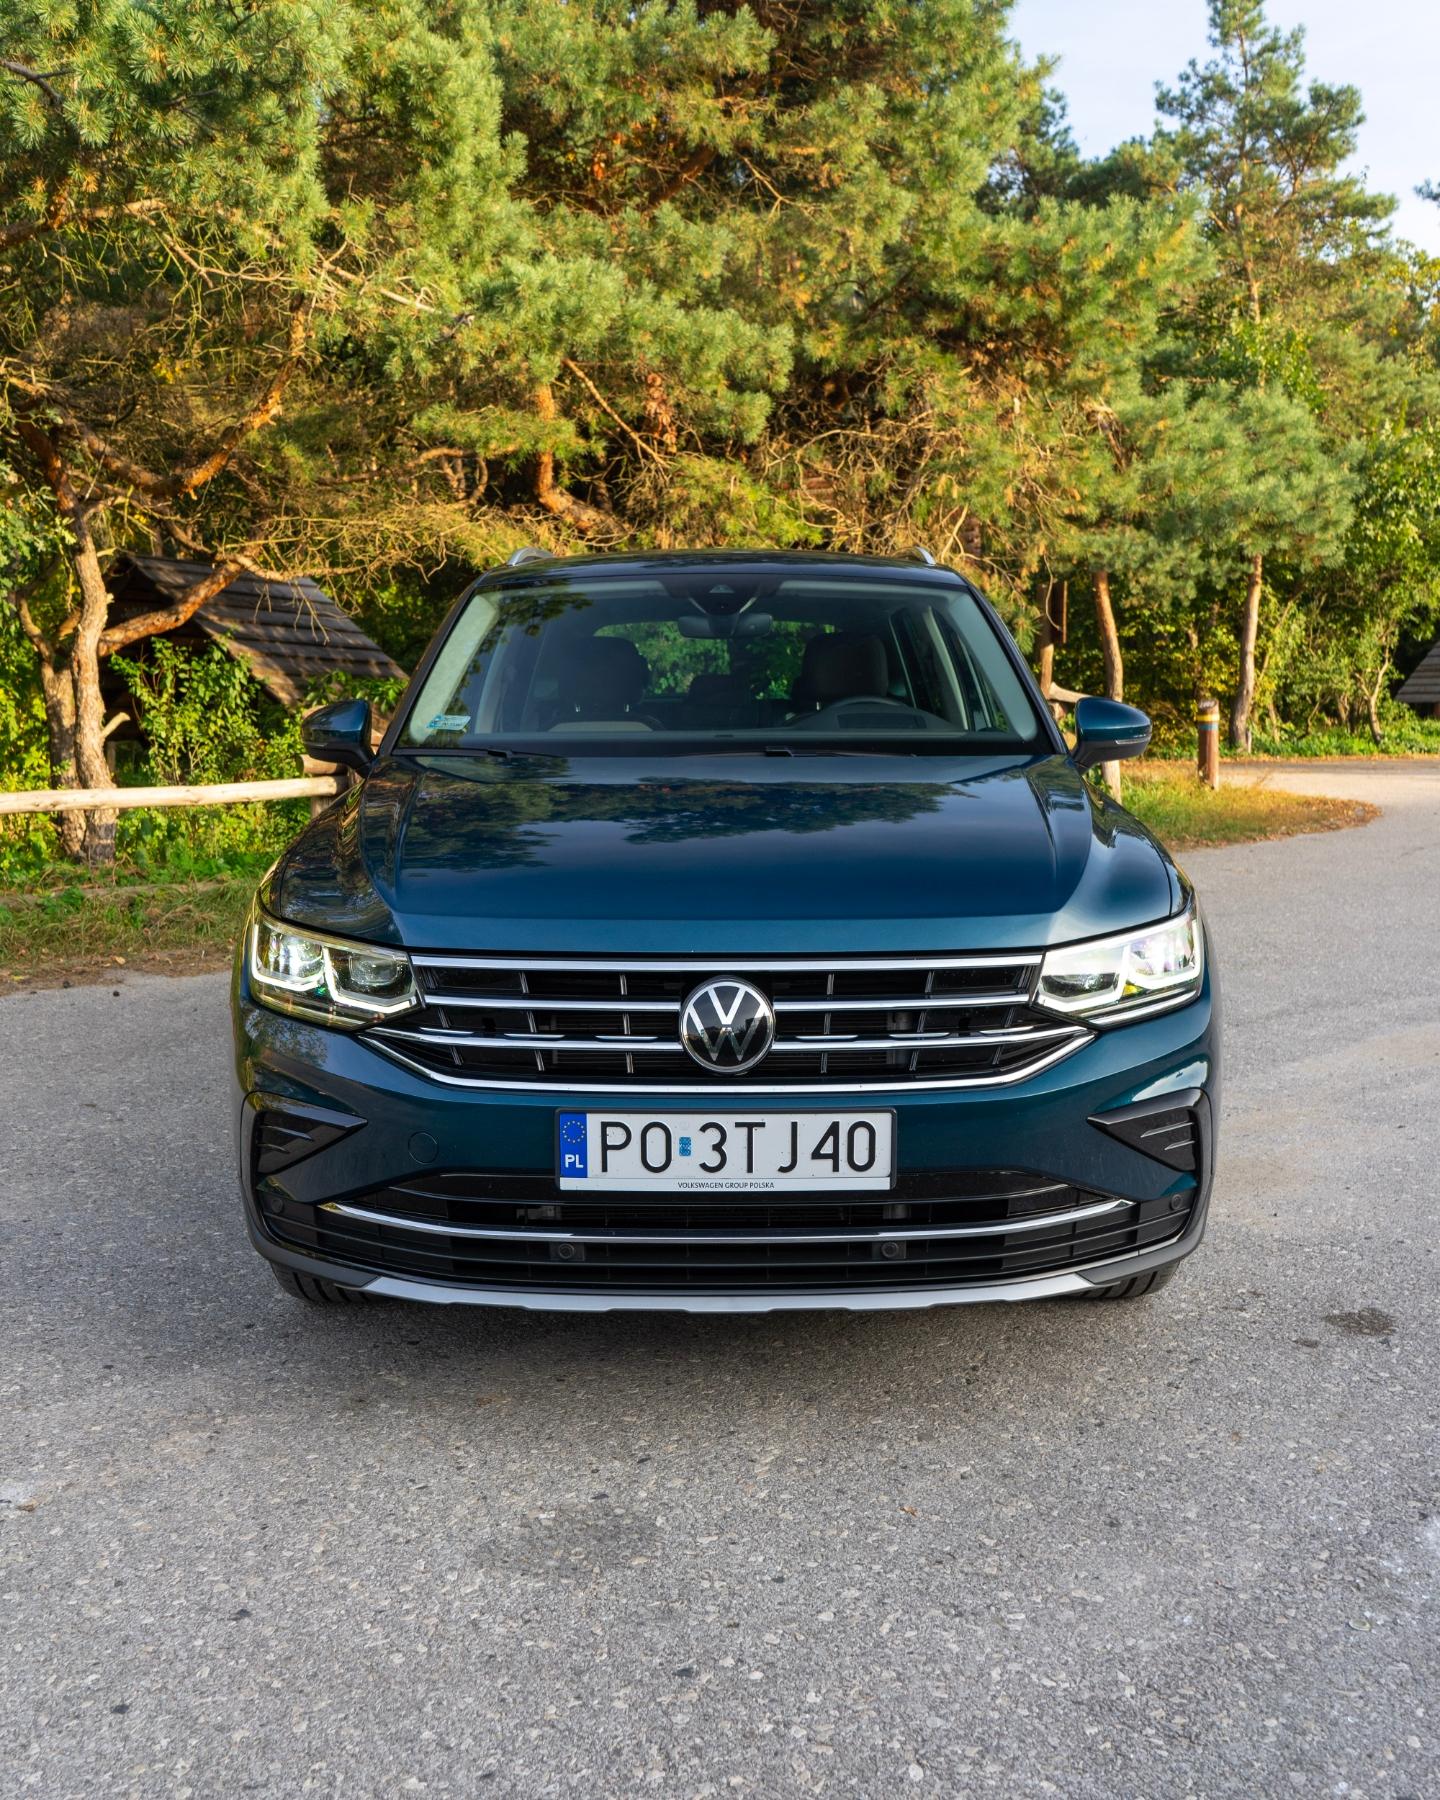 Volkswagen Tiguan Plug-In Hybrid test